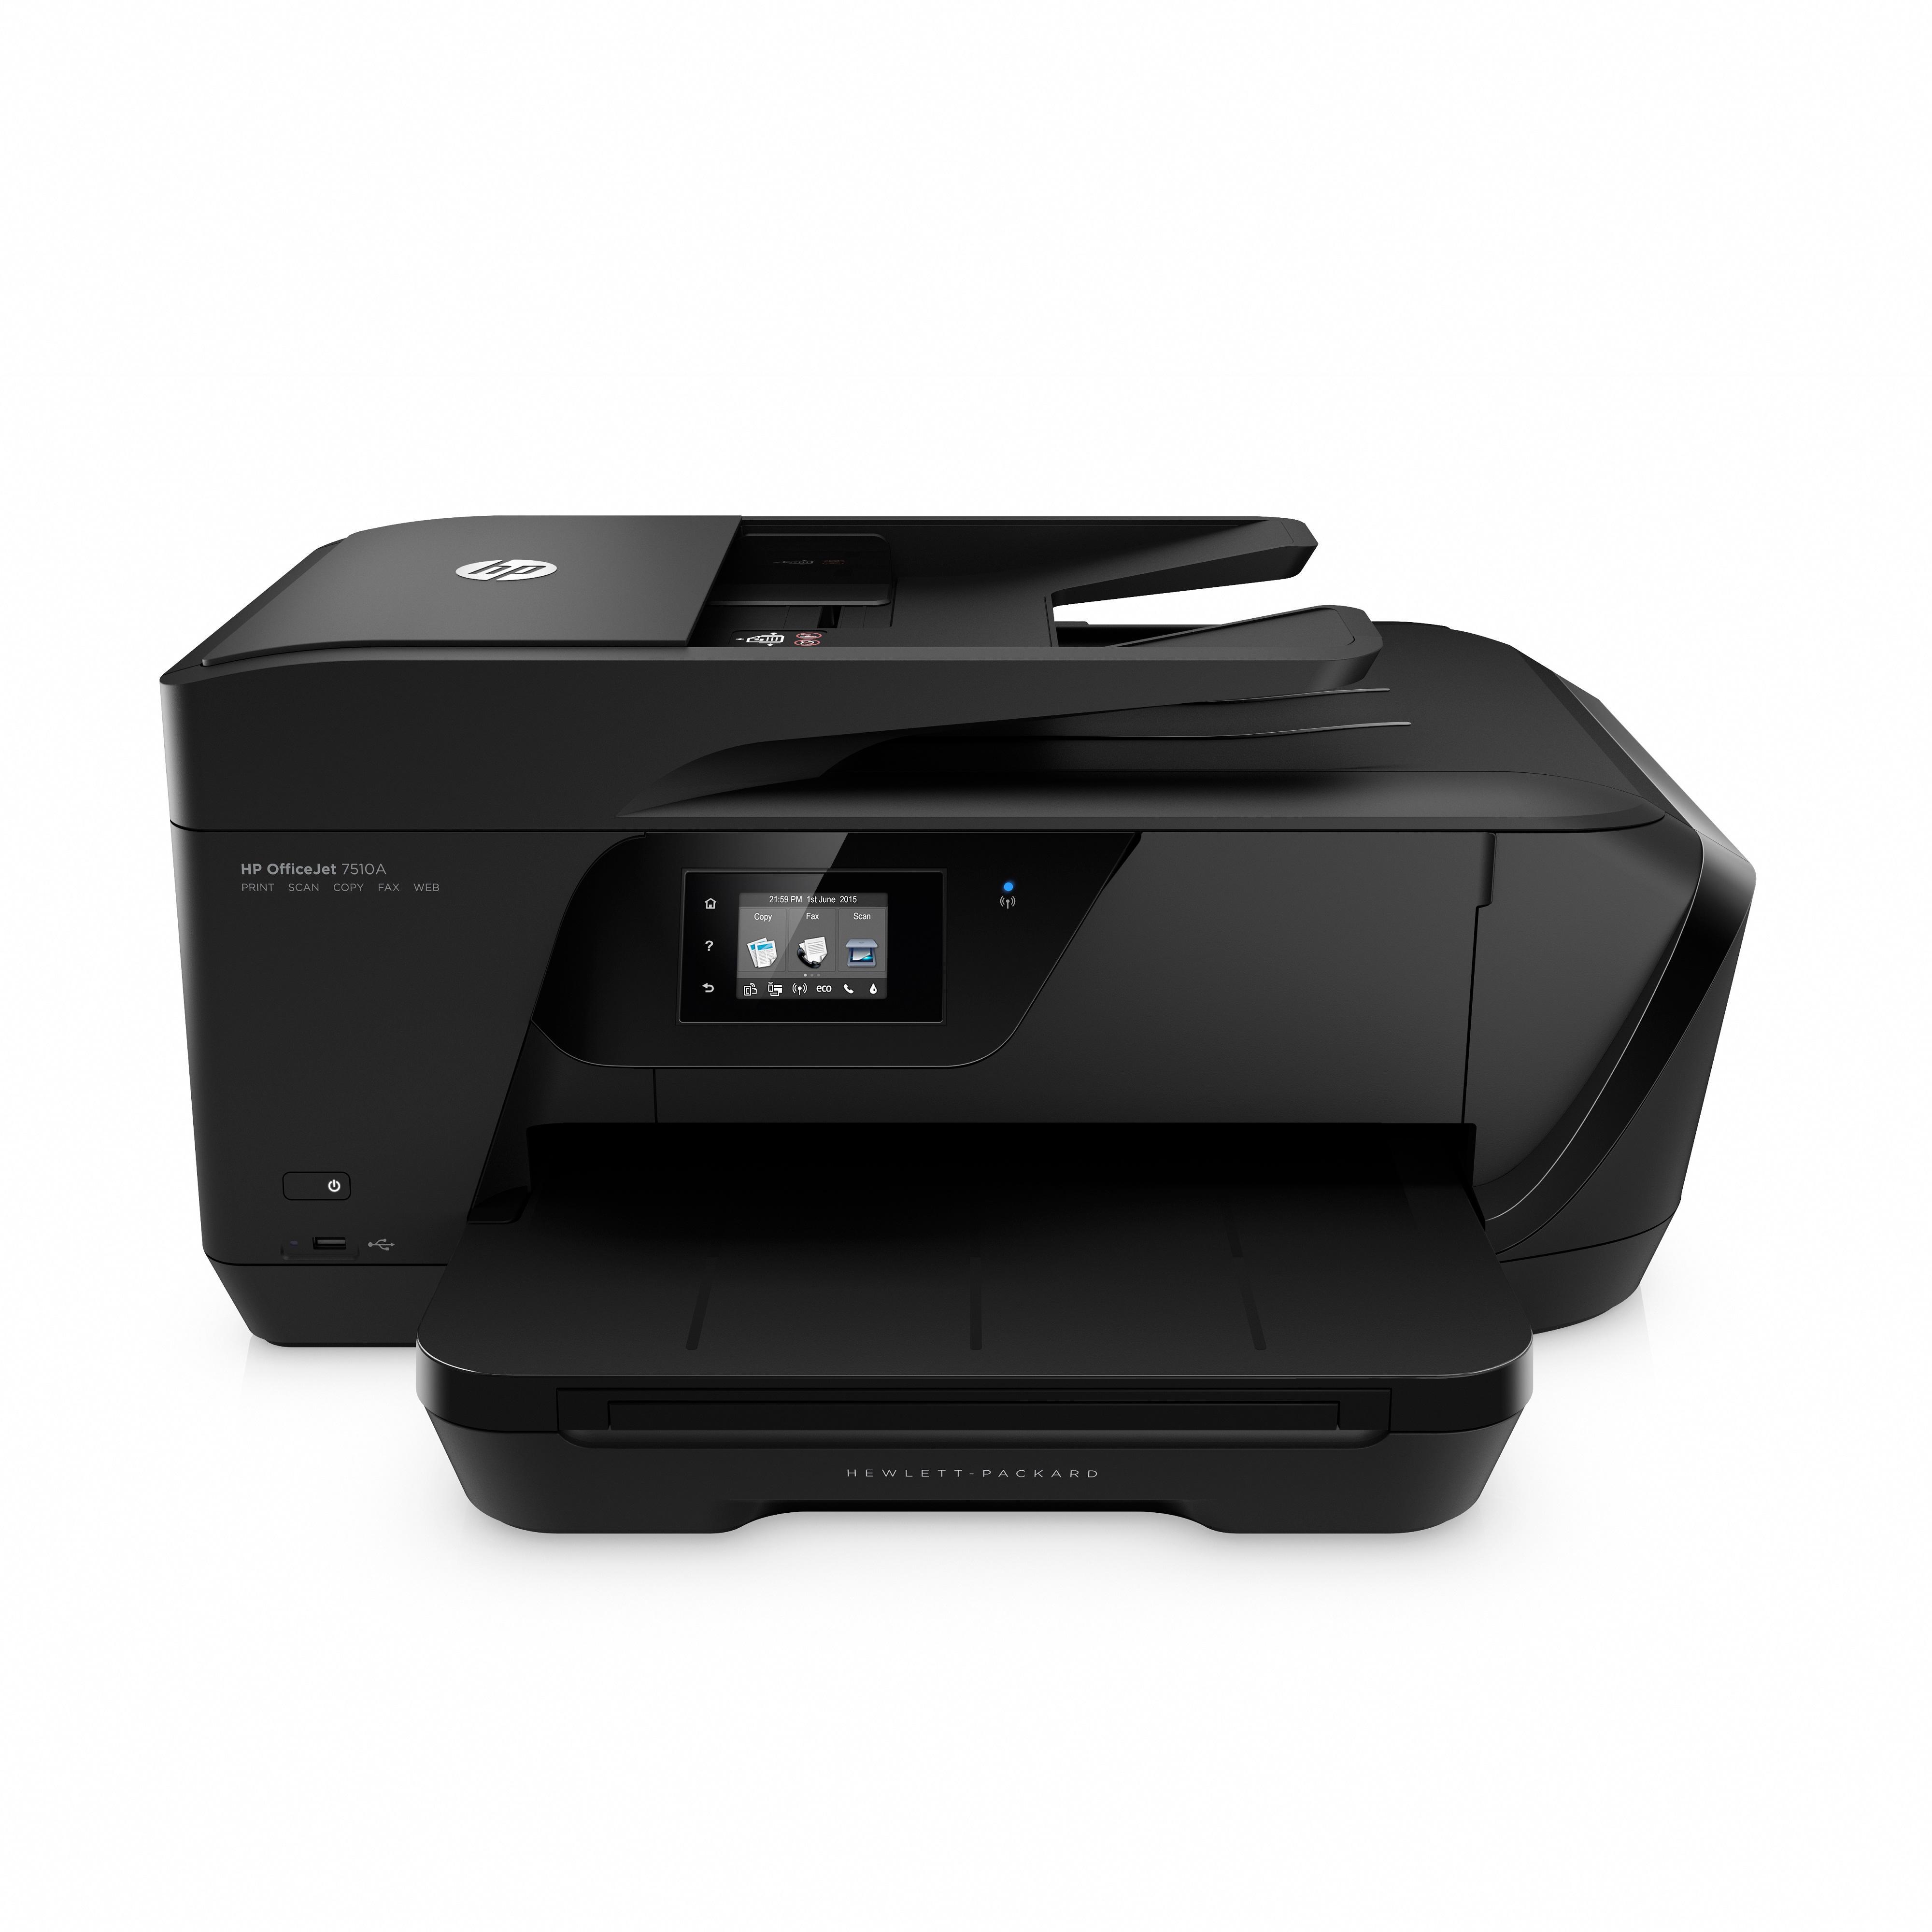 hp officejet 7510 a3 multifunktionsdrucker schwarz amazon. Black Bedroom Furniture Sets. Home Design Ideas